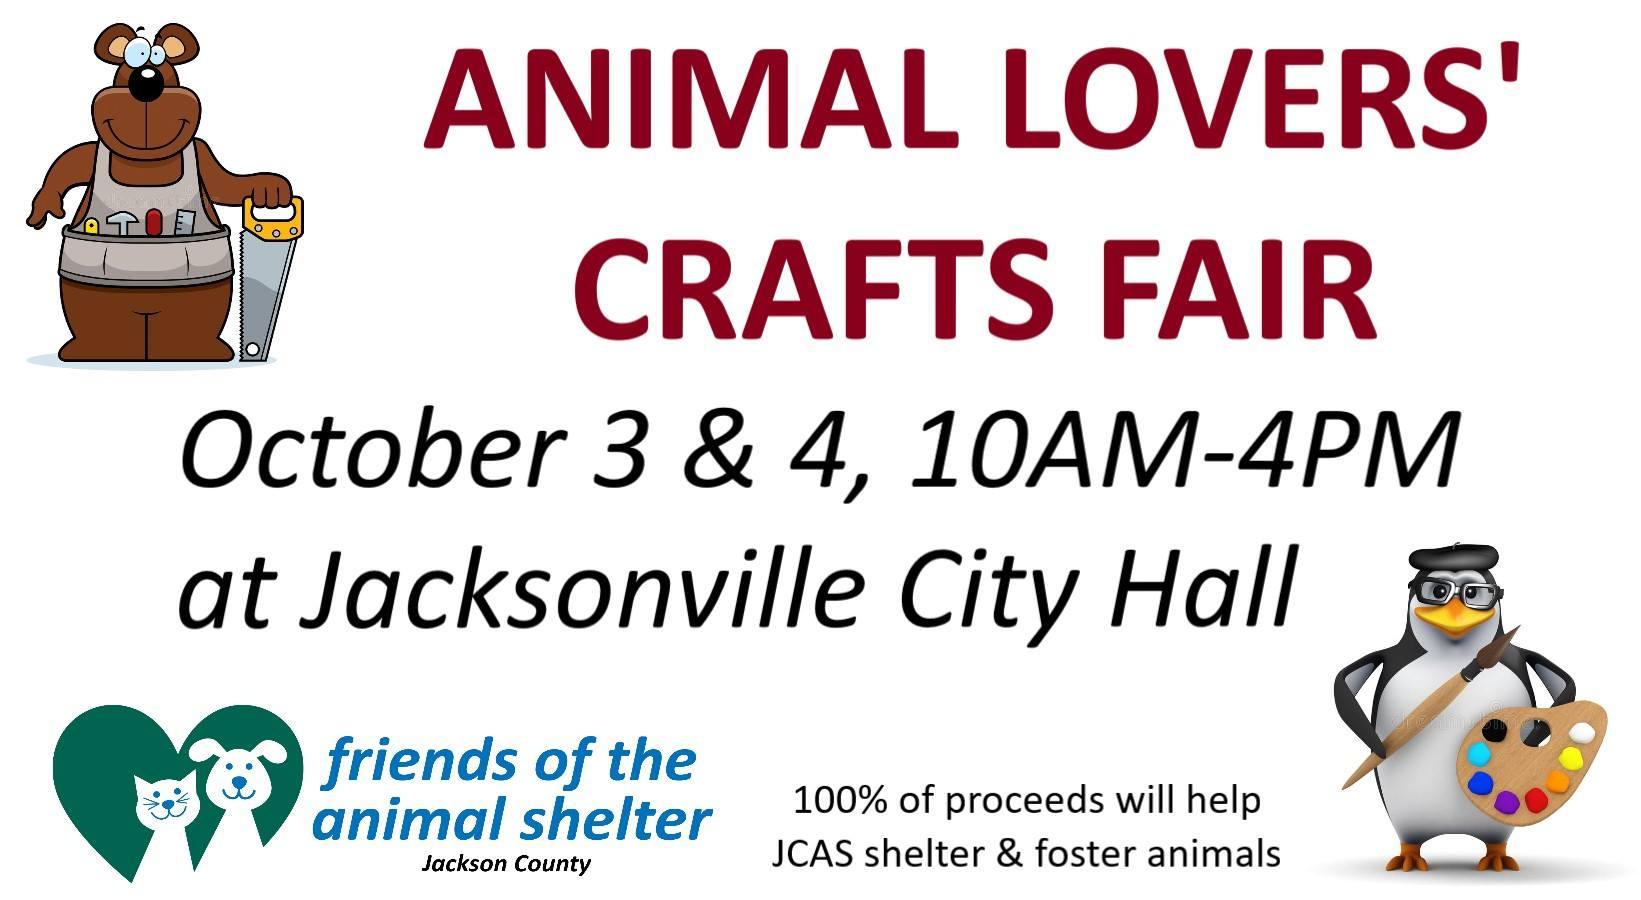 Animal Lovers' Crafts Fair  Oct. 3-4